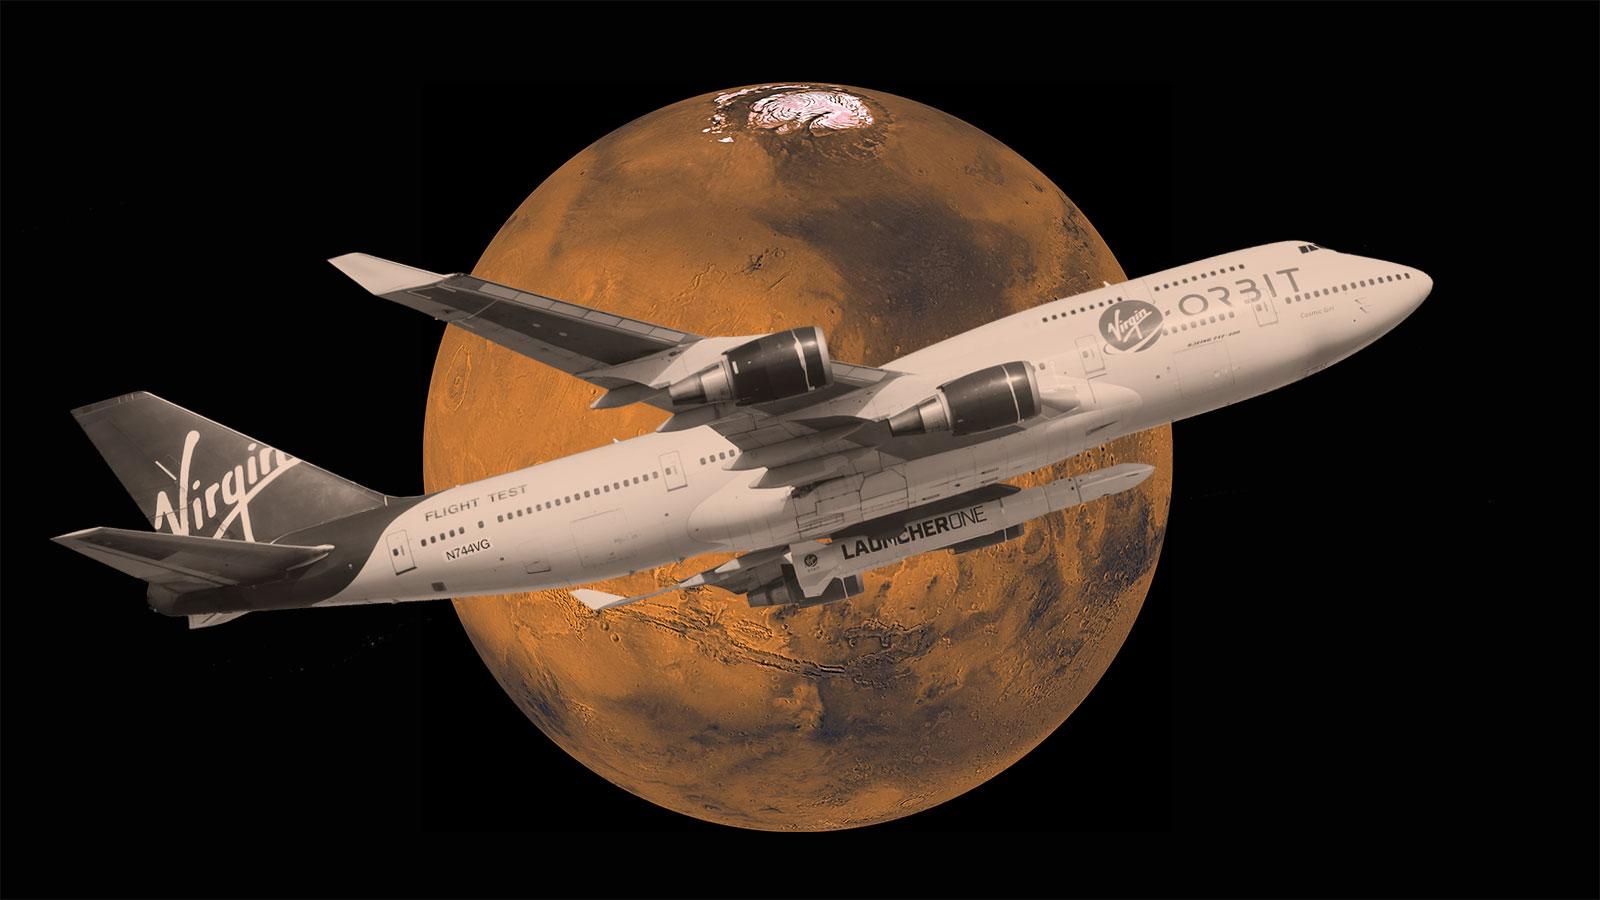 Virgin Orbit says it wants to send tiny spacecraft to Mars in 2022